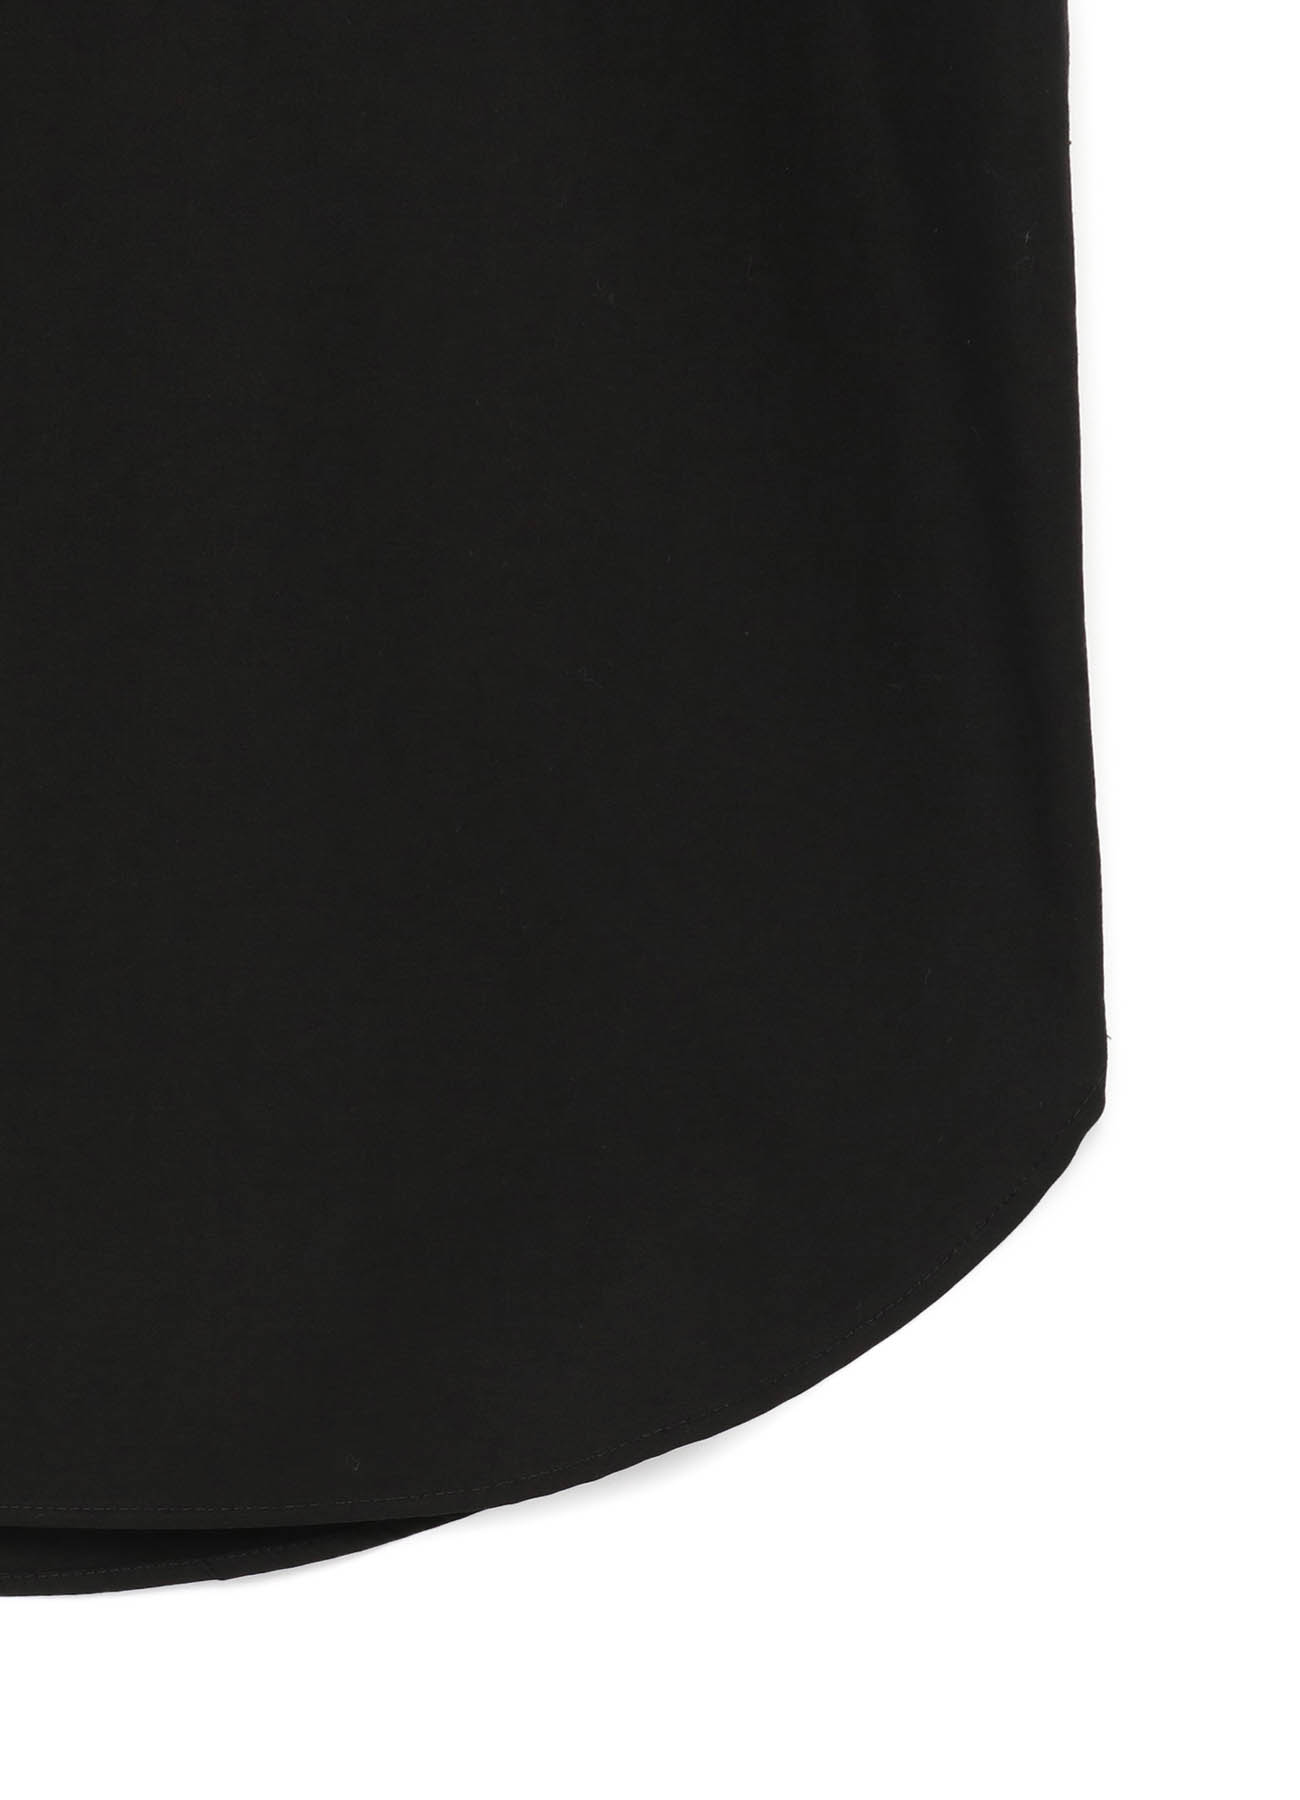 100/2 Cotton Broad Patch Pocket Shirt